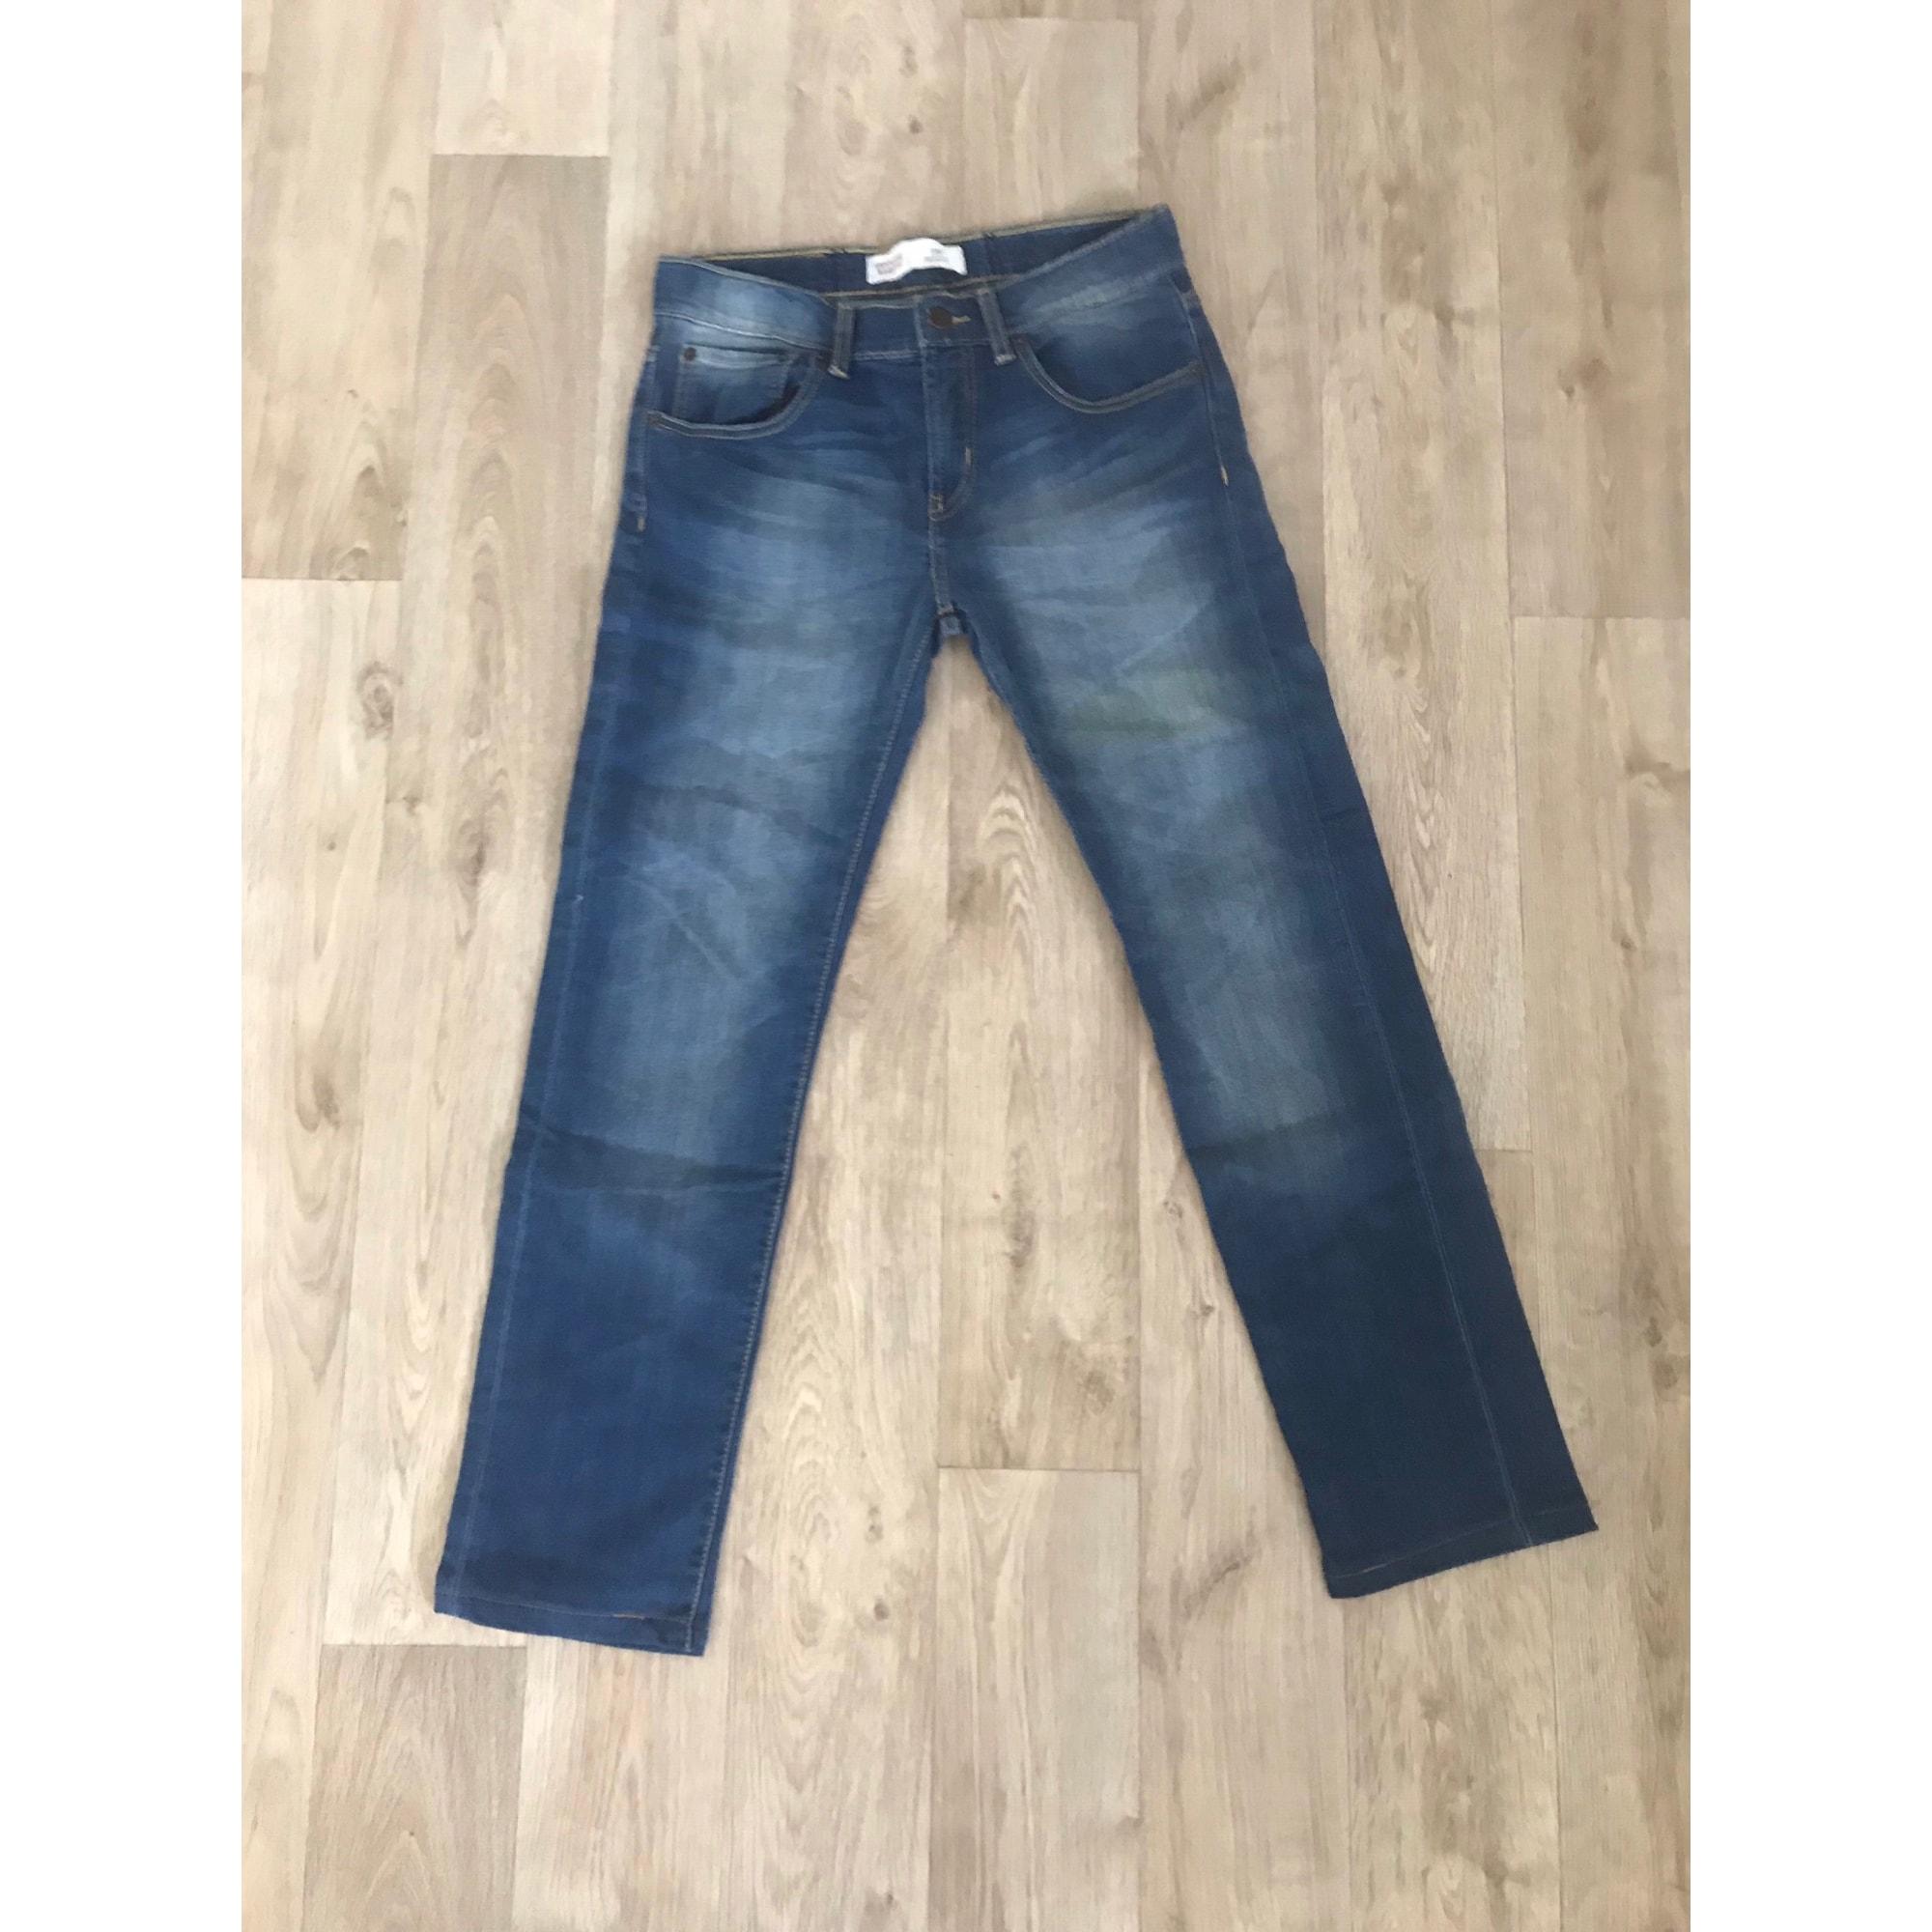 Pants LEVI'S Blue, navy, turquoise